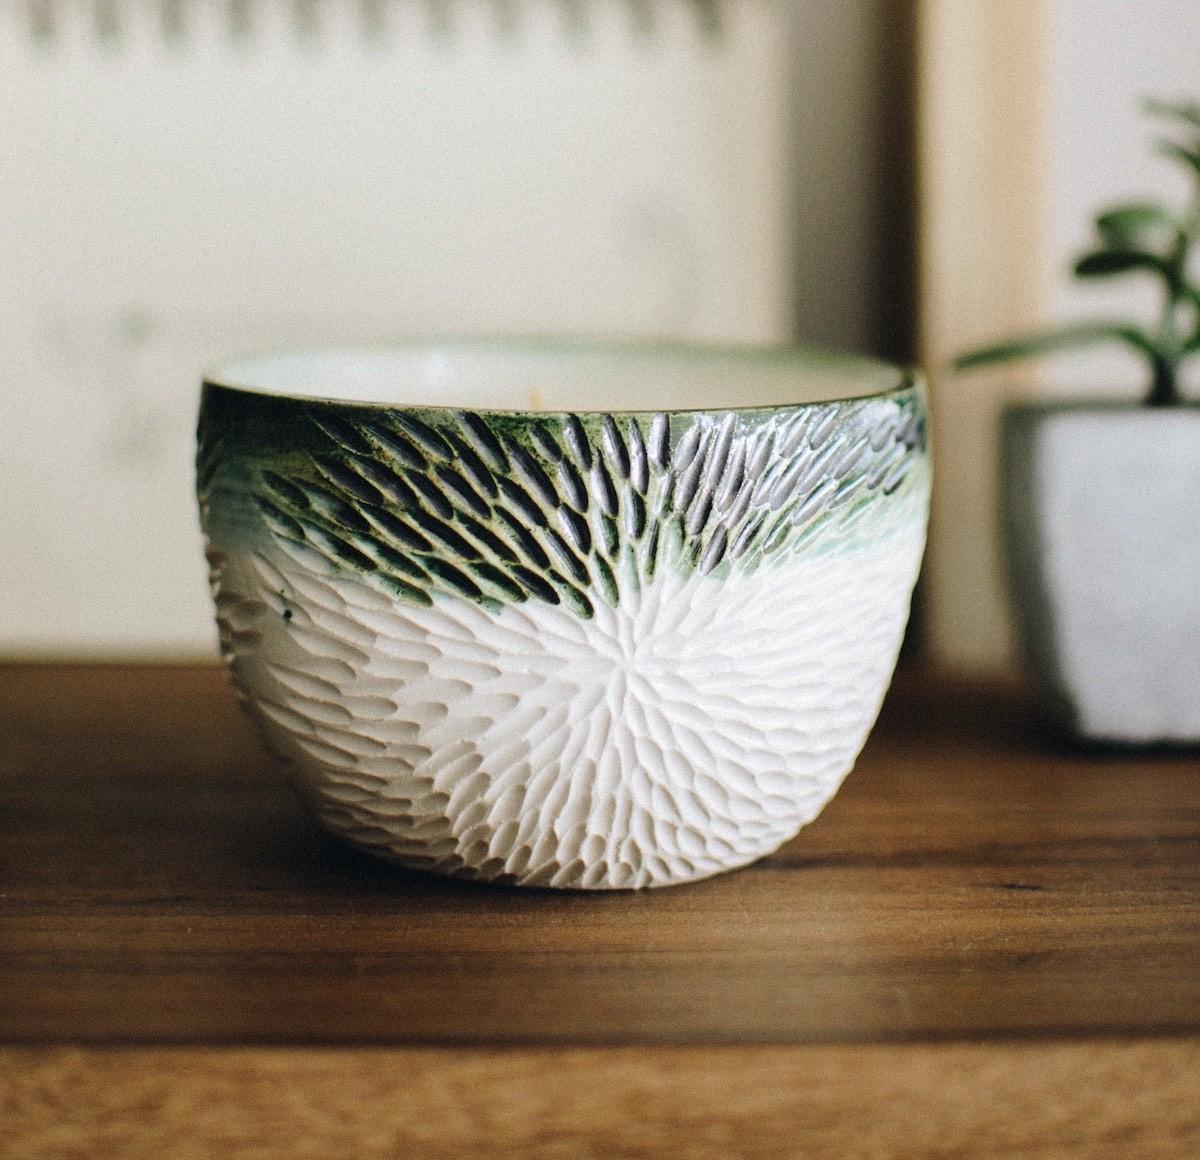 An Ayurvedic Bowl.